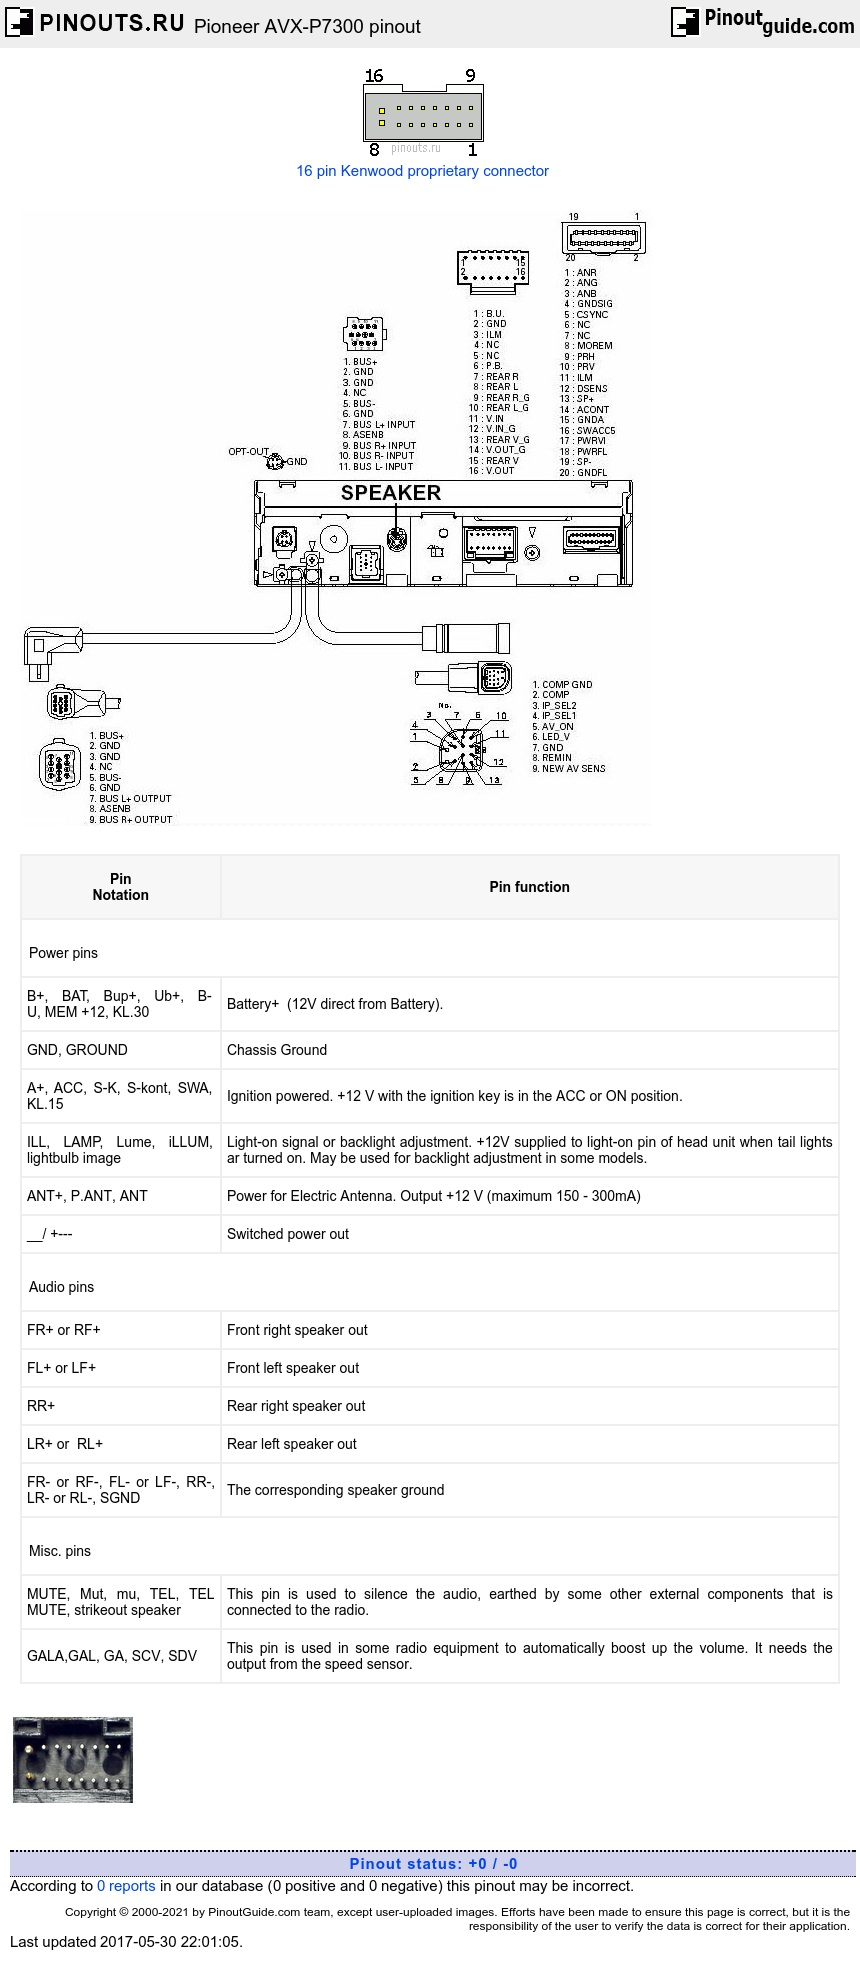 Pioneer AVX-P7300 pinout diagram @ pinoutguide.com